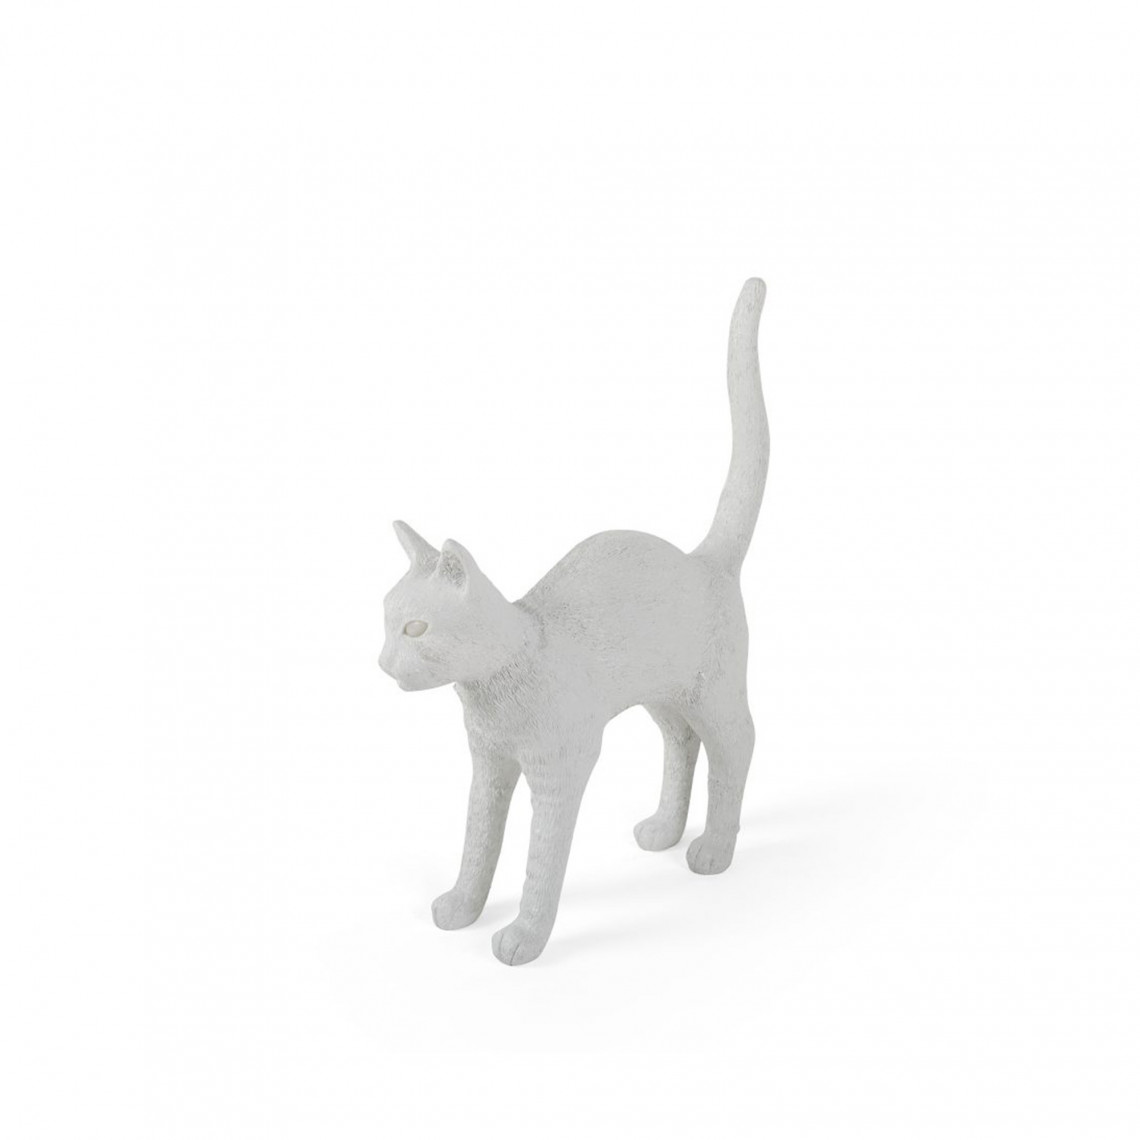 Jobby The Cat - Vit